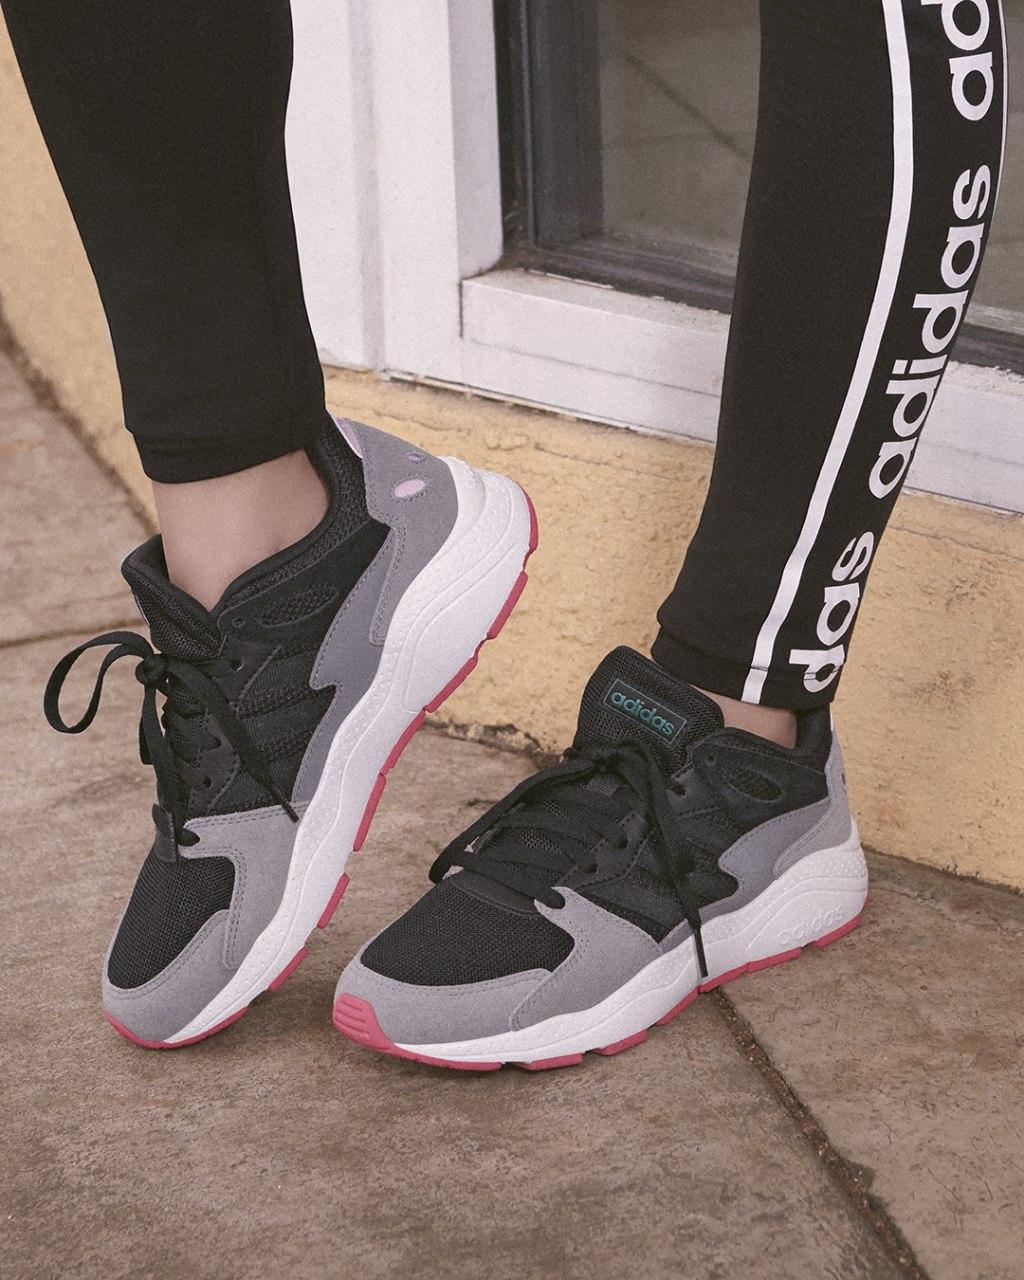 El diseño molestarse Completo  belwest.shoes – Telegram